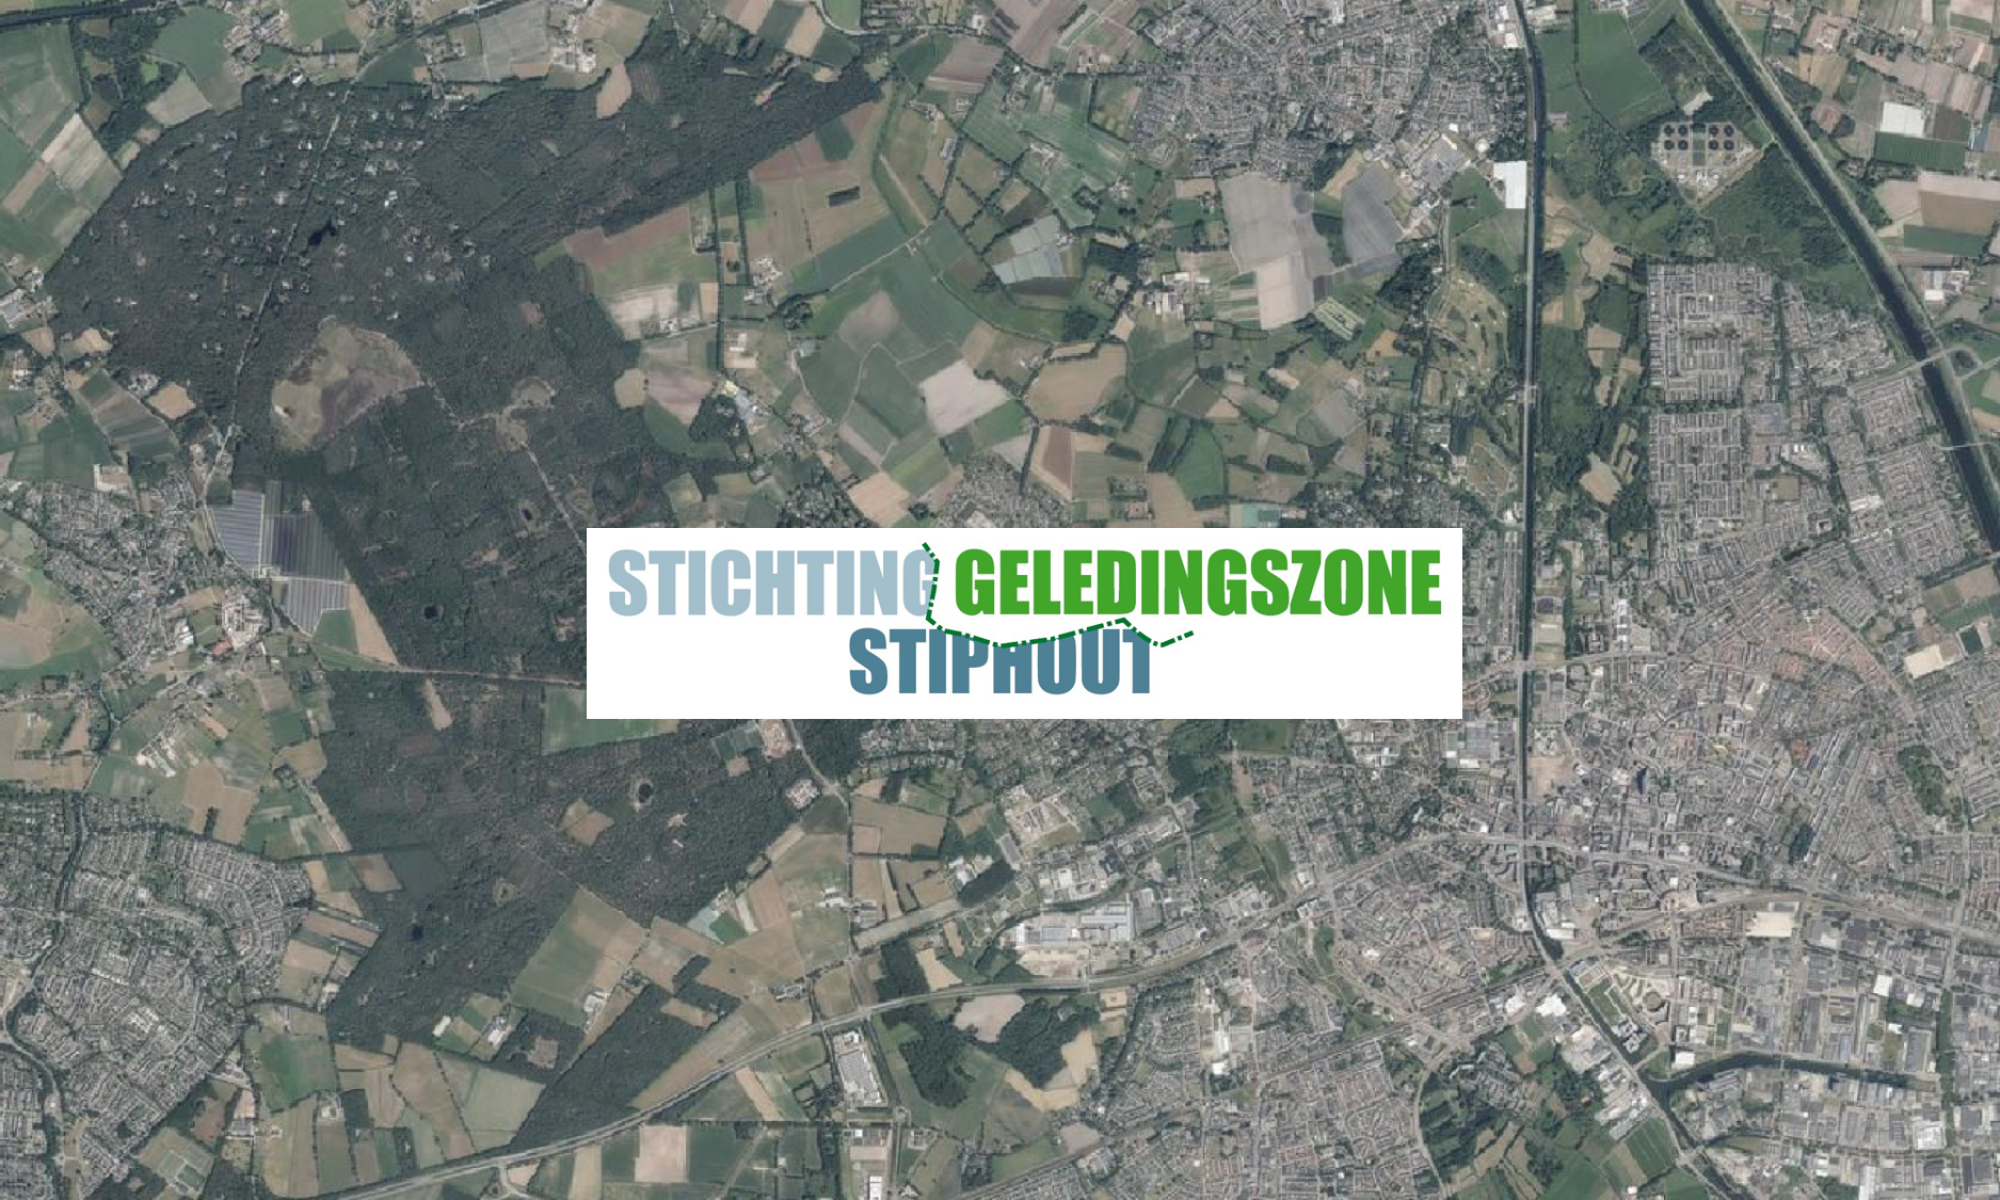 Stichting Geledingszone Stiphout